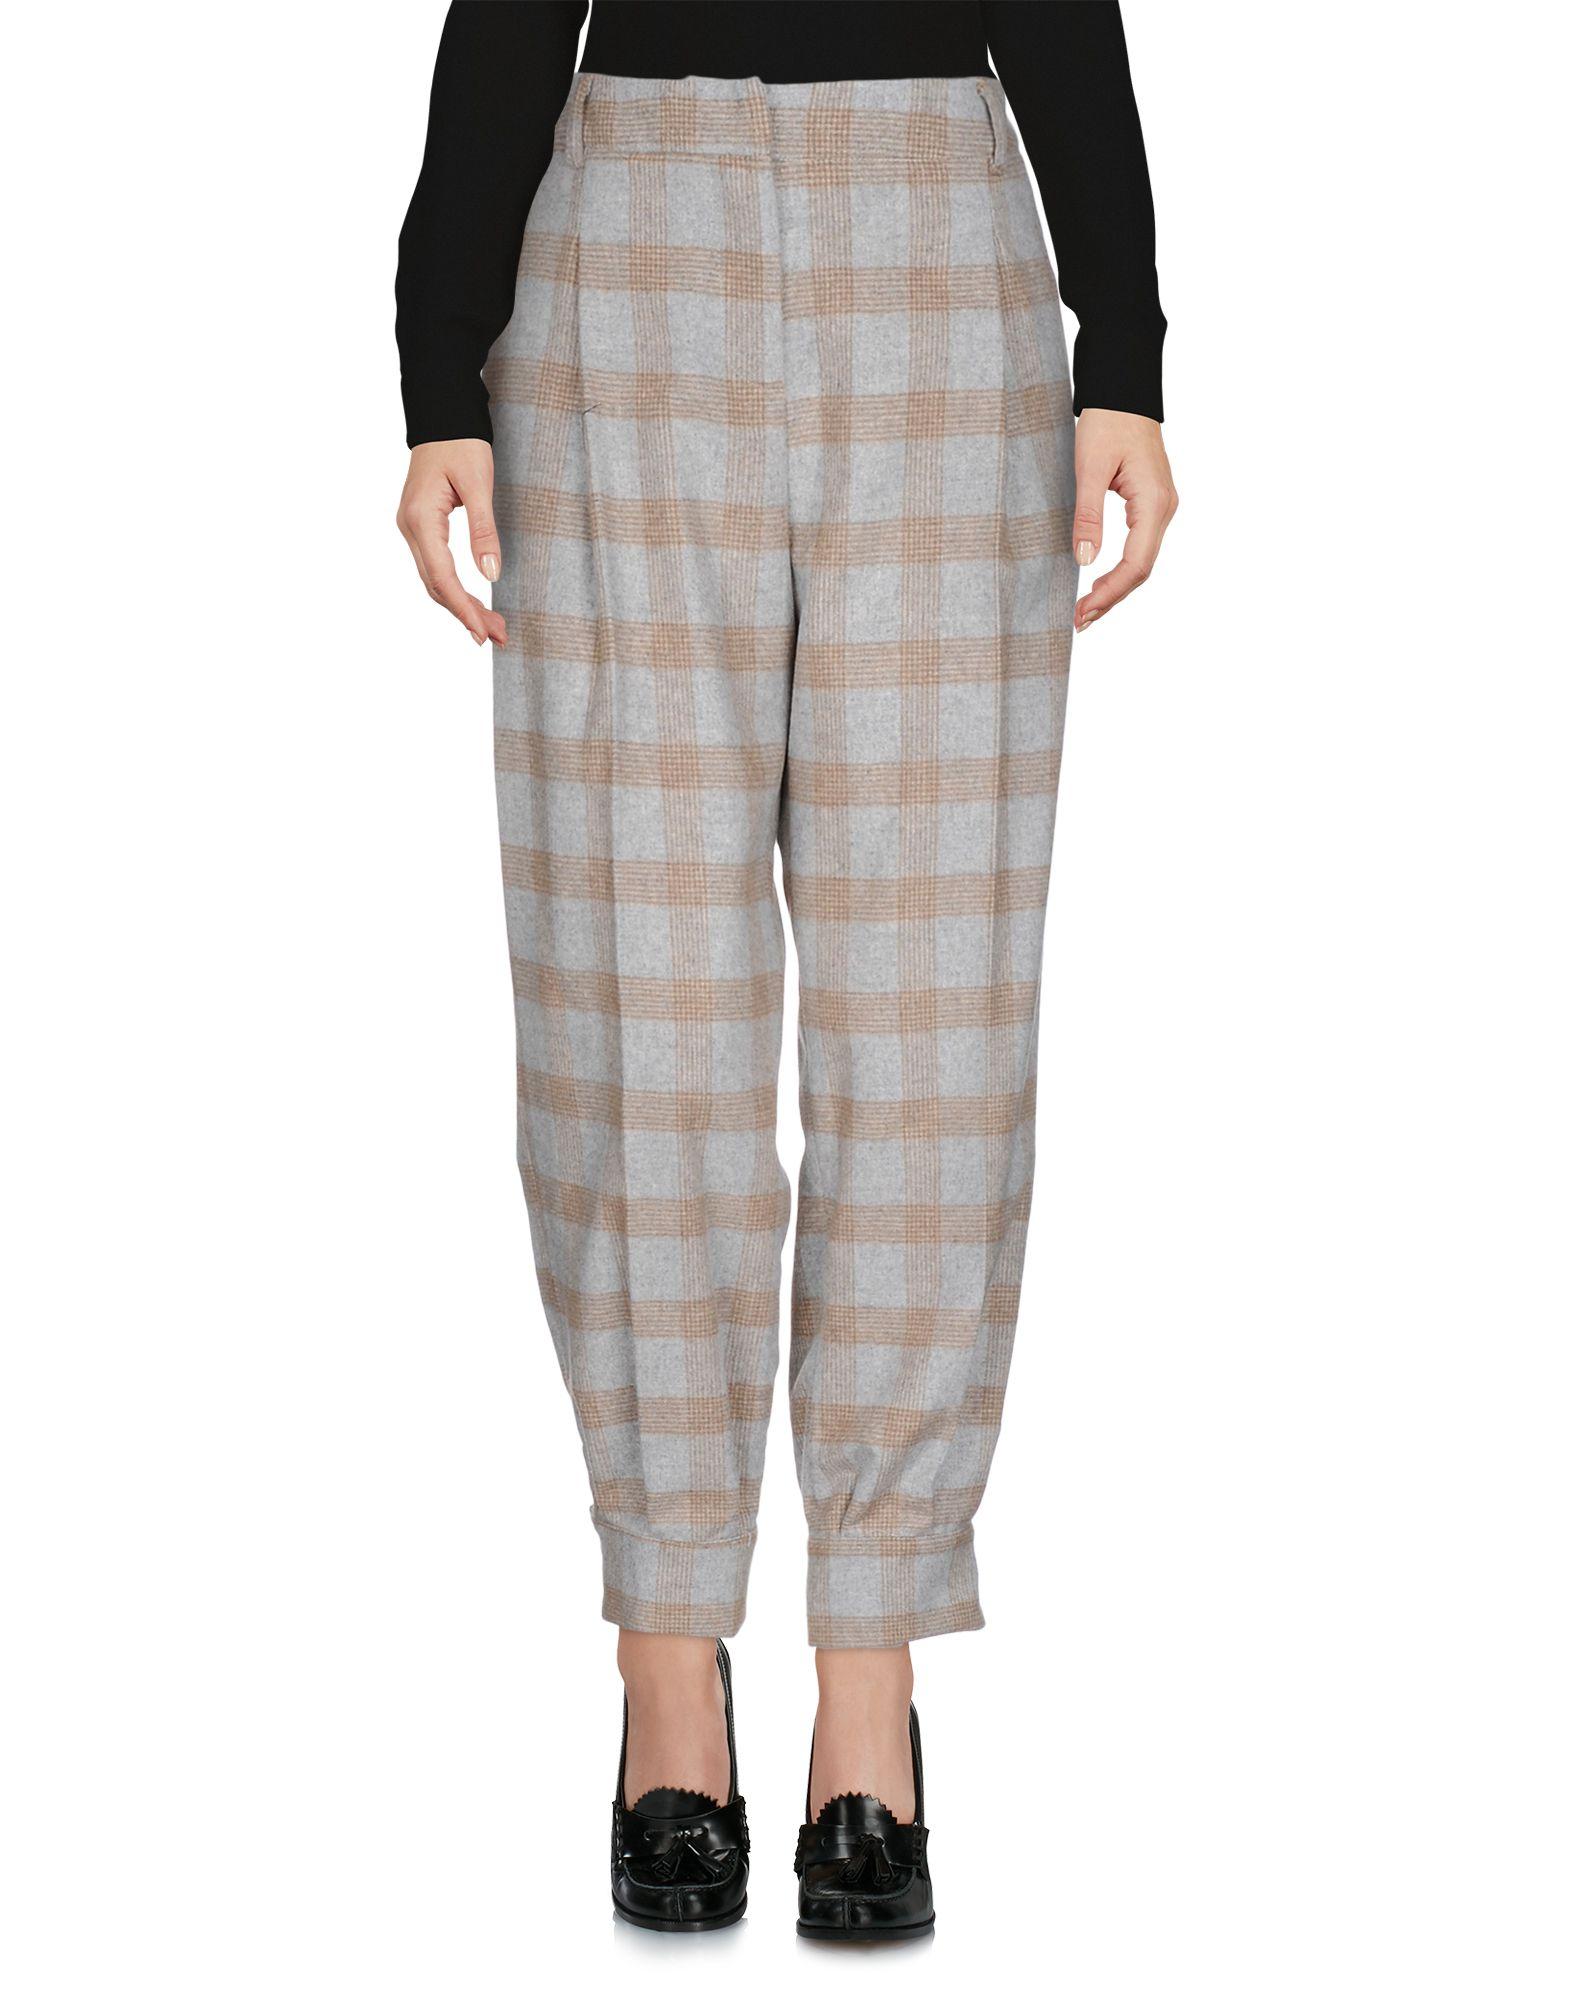 Pantalone Katia Giannini donna donna - 13166696ND  billiger Laden